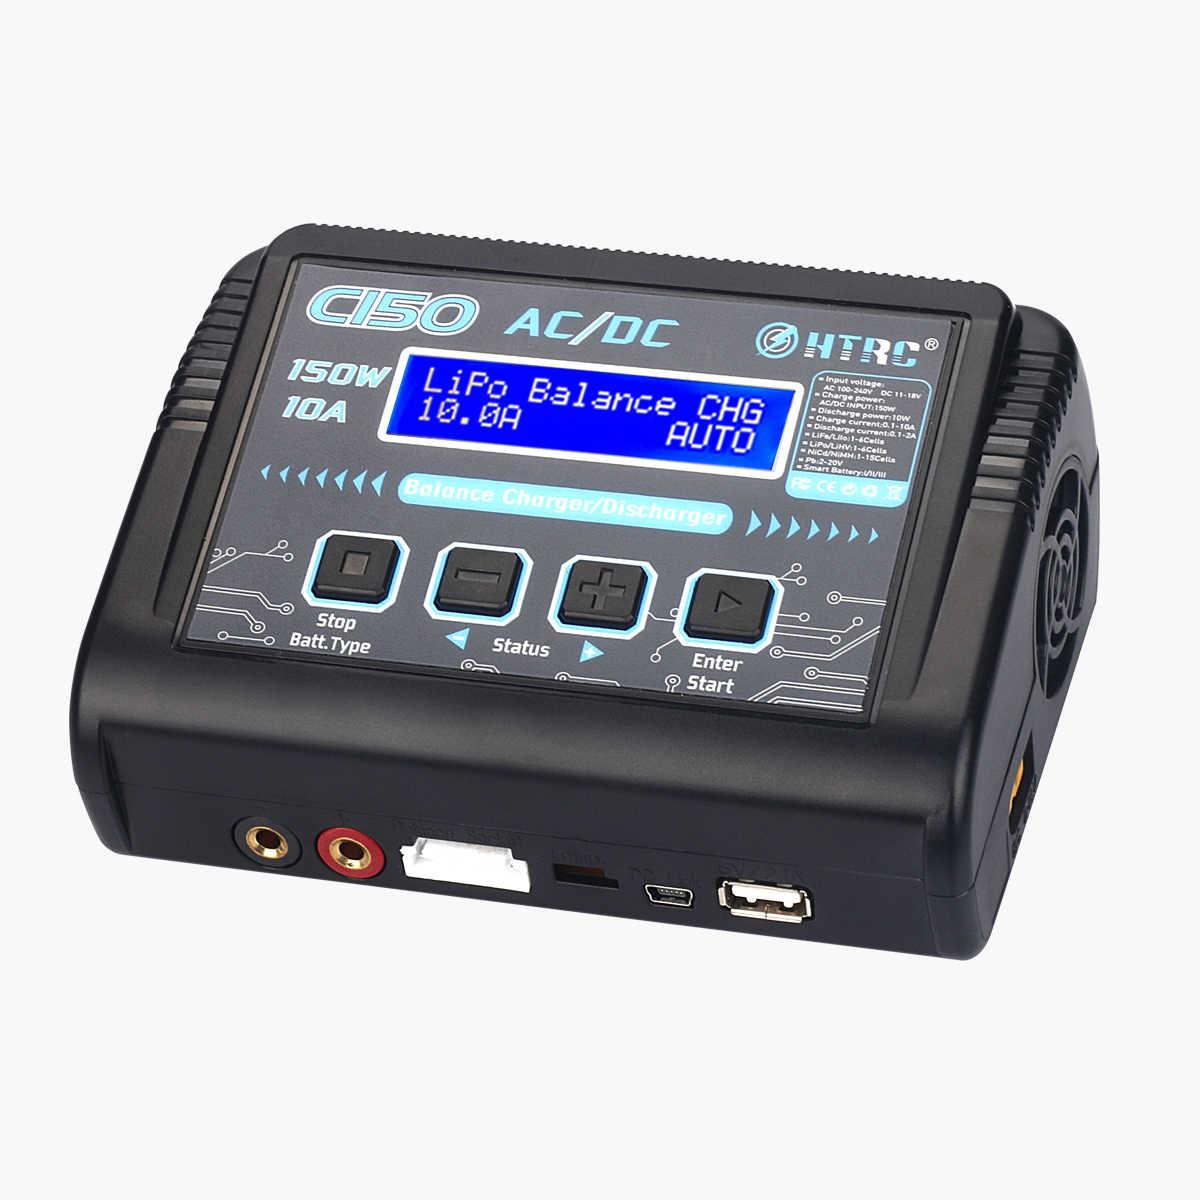 Hot Sale HTRC C150 Lipo Charger Baterai Rc AC/DC 150W 10A RC Keseimbangan Discharger untuk LiPo LiHV liFe Lilon NiCd NiMh Pb Baterai